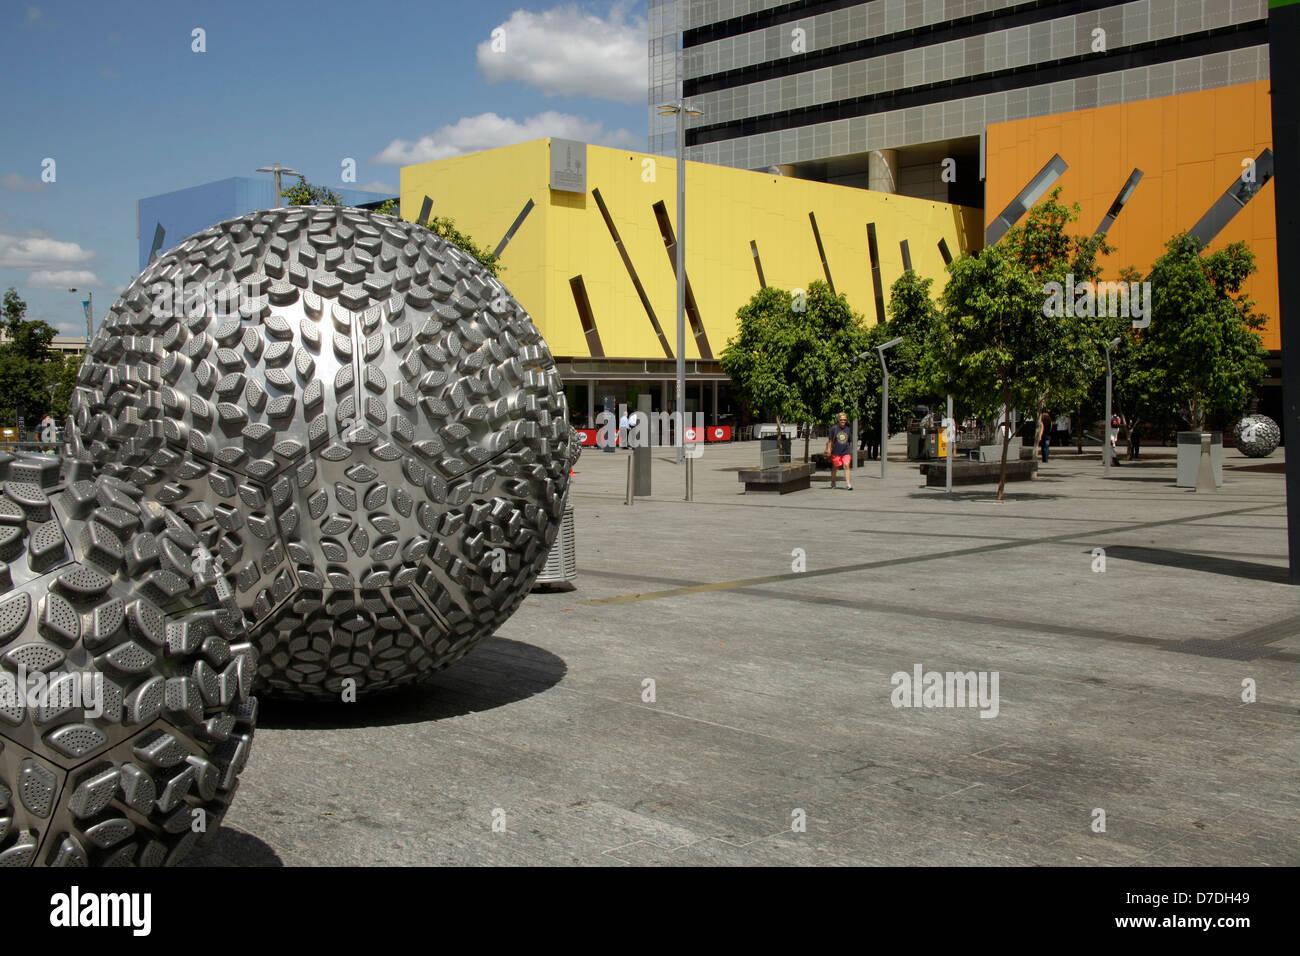 modern Architecture with silver balls in Brisbane, Queensland, Australia - Stock Image